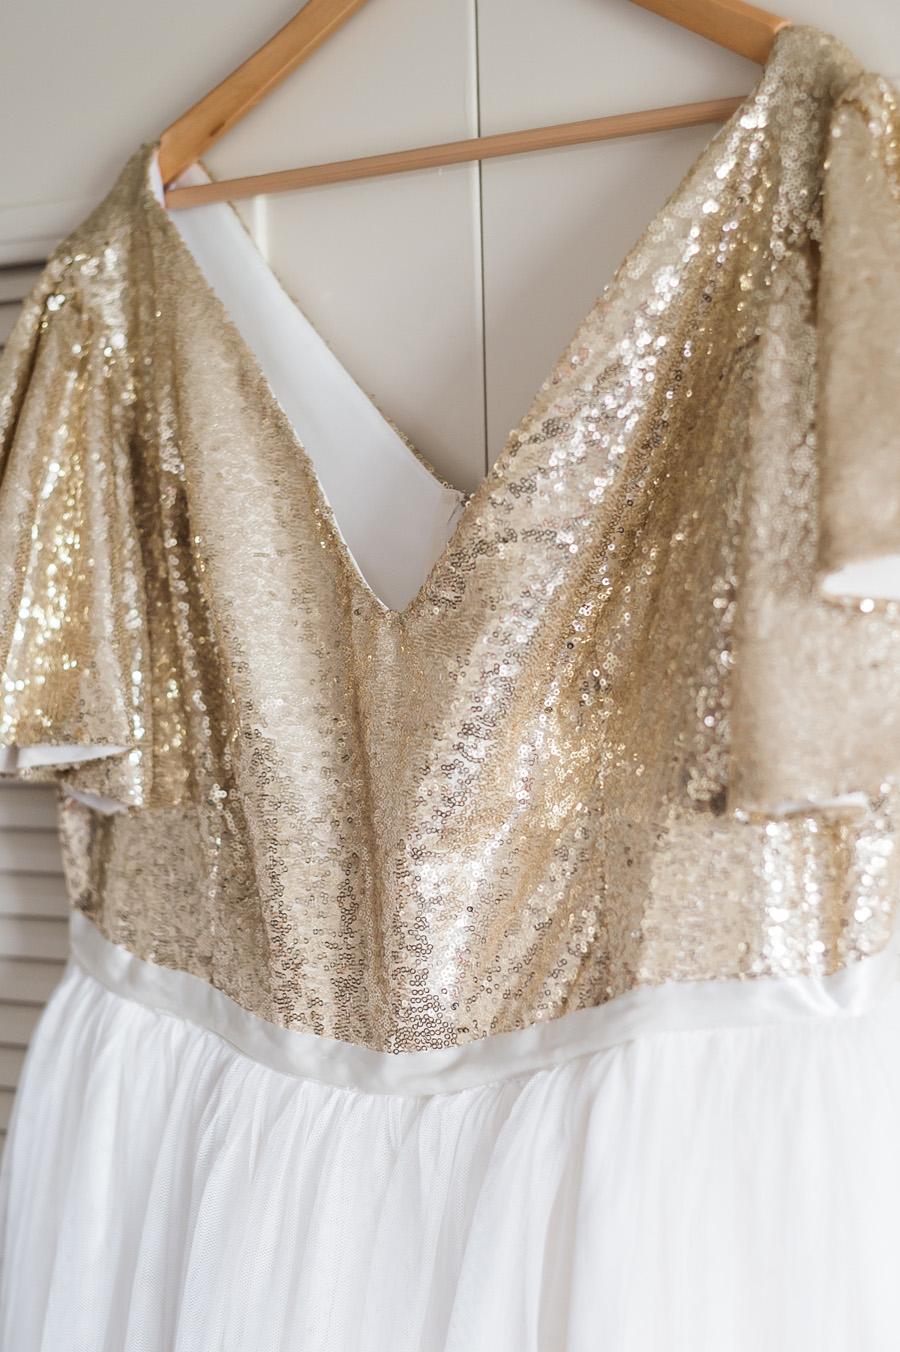 Bride's sparkly wedding dress.